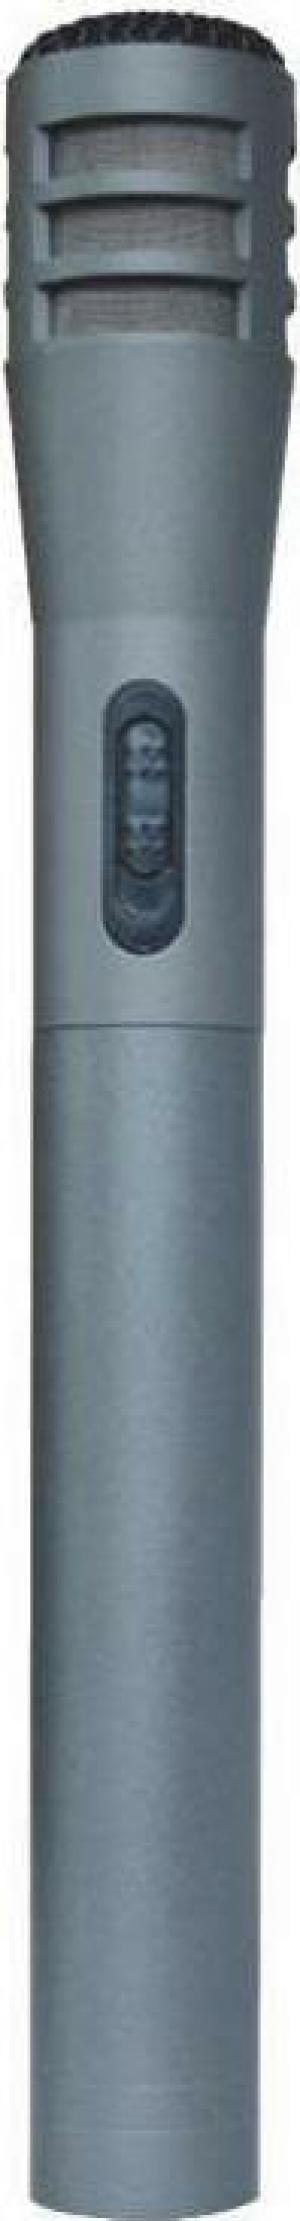 Bst MKZ10 πυκνωτικό μικρόφωνο χειρός